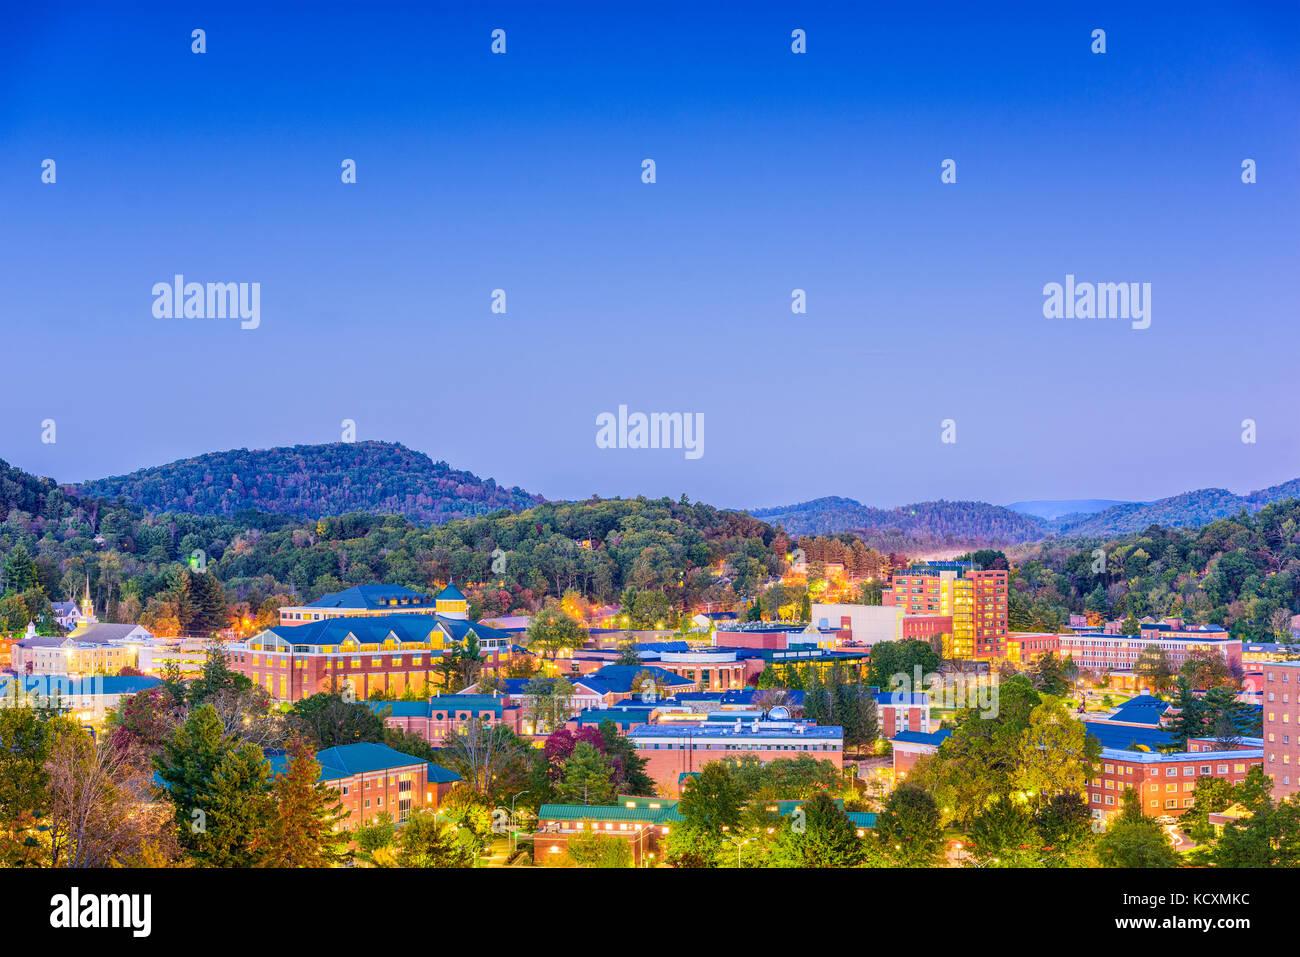 Boone, North Carolina, USA campus and town skyline. Stock Photo